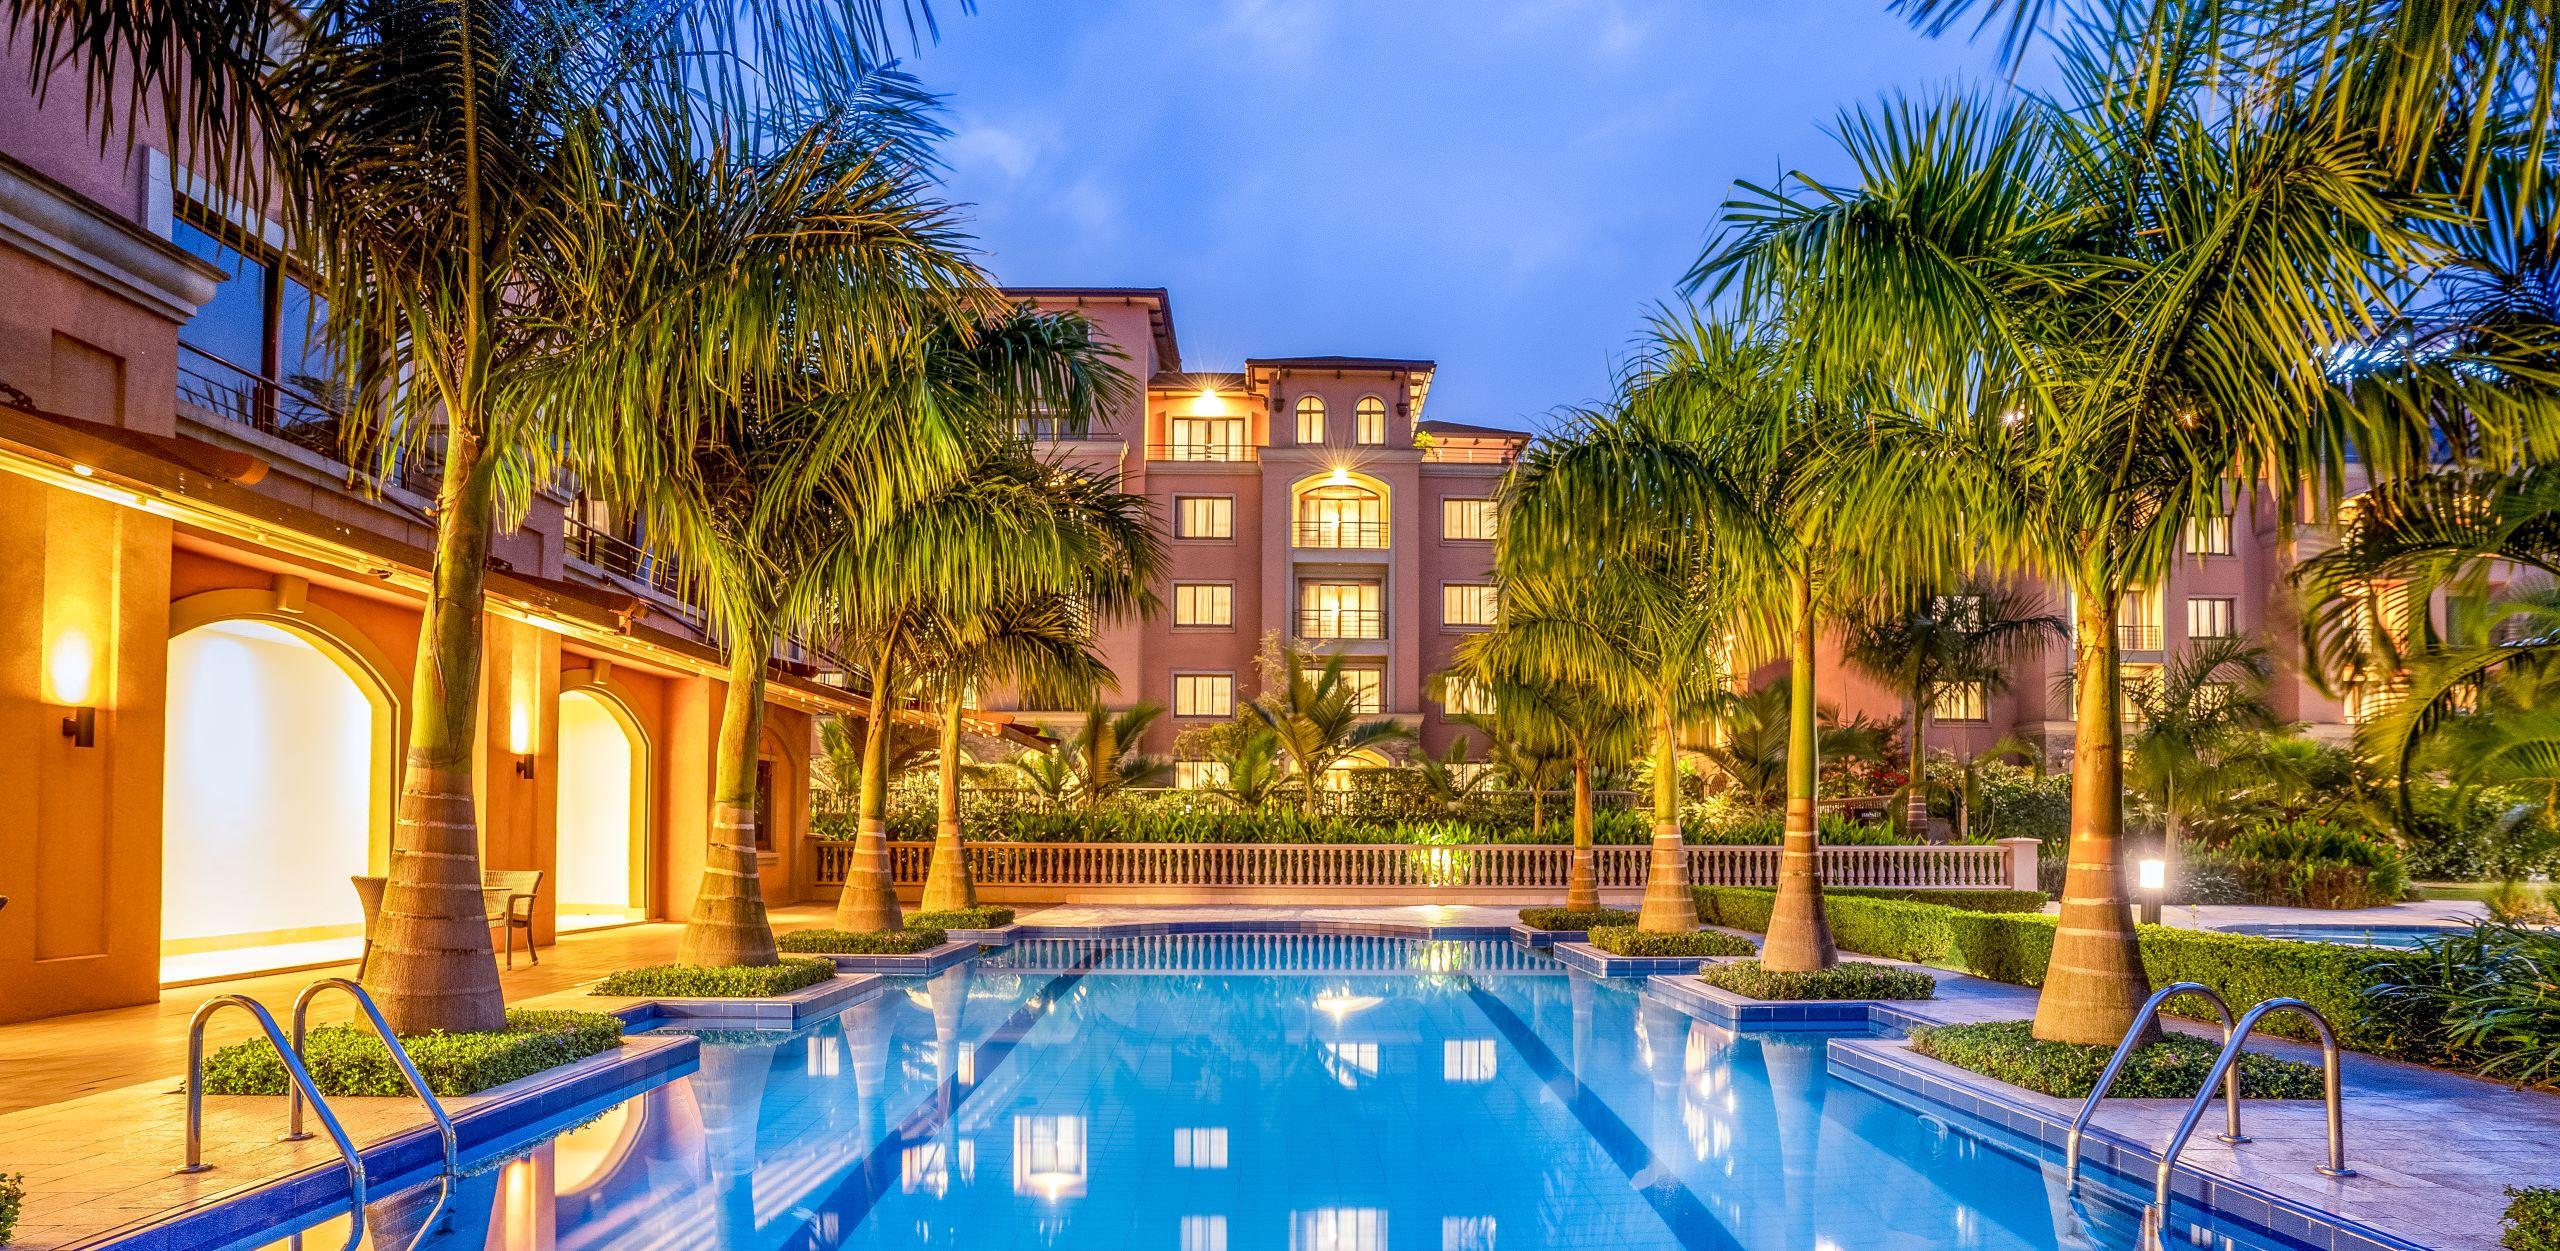 Homepage 1: Swimming pool at night